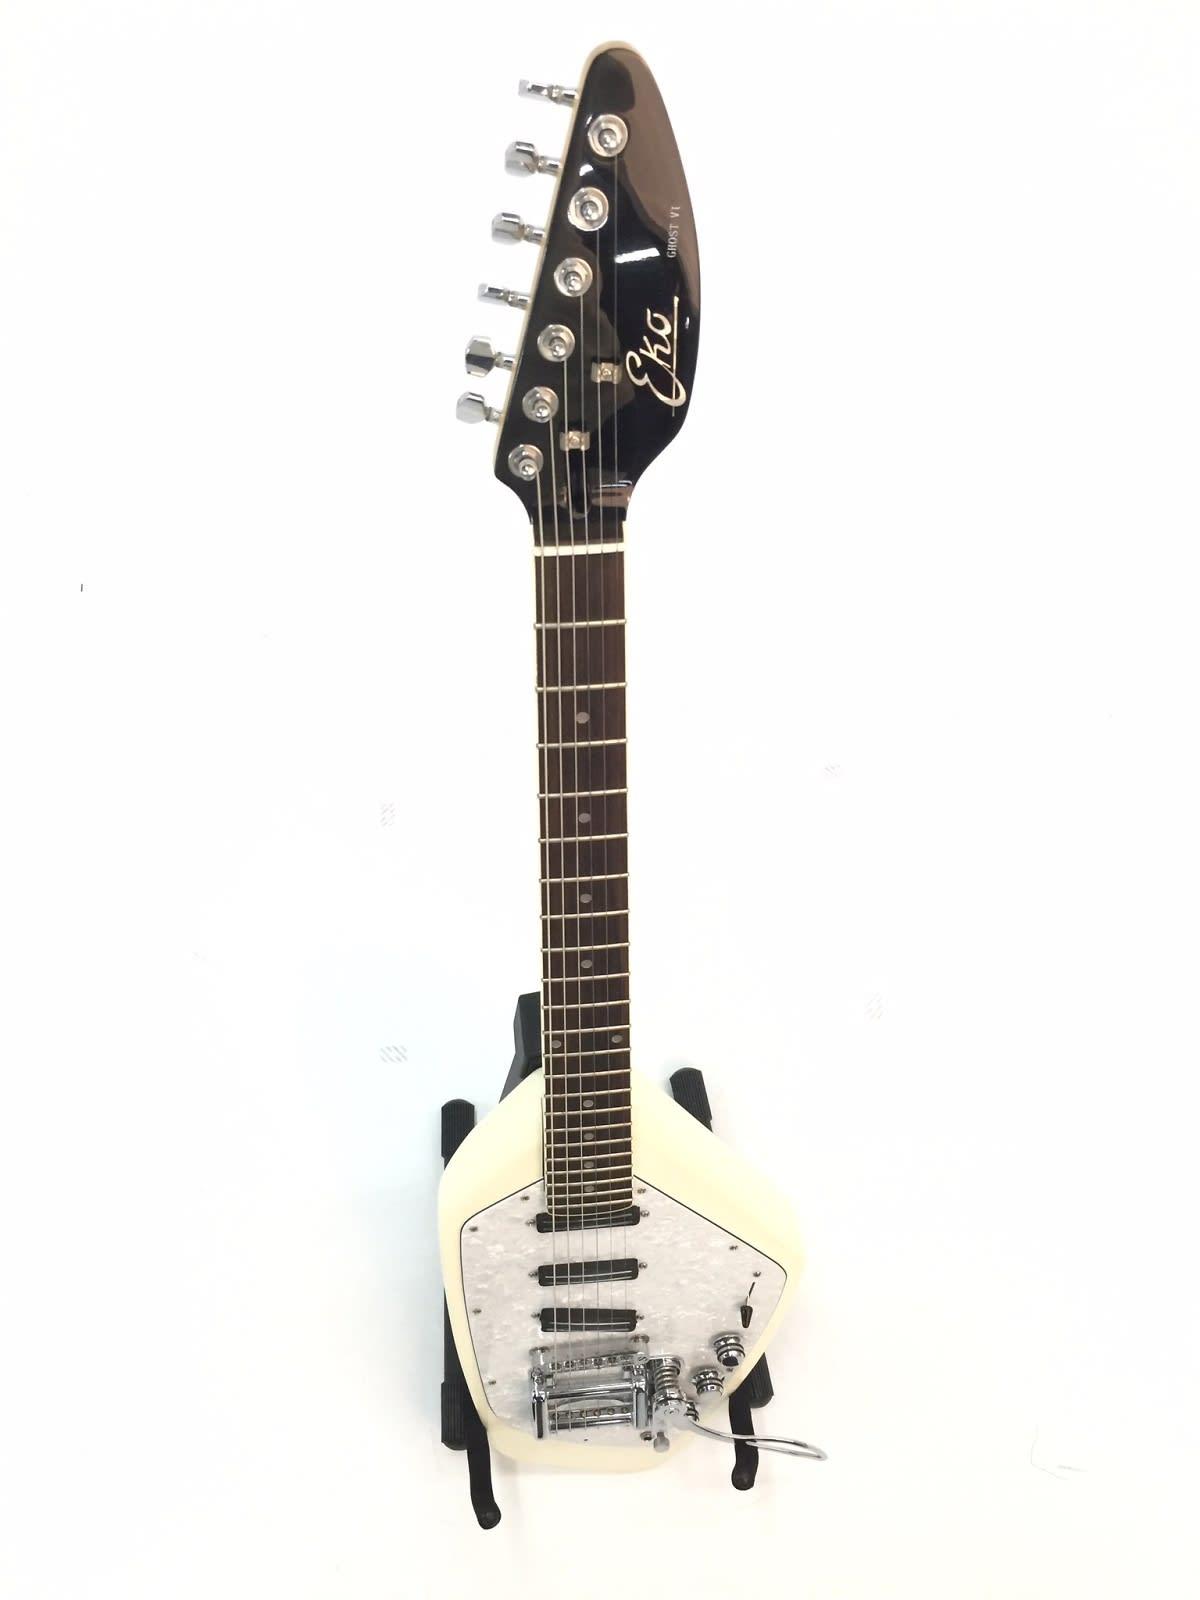 eko ghost vi electric guitar w tremolo white reverb. Black Bedroom Furniture Sets. Home Design Ideas